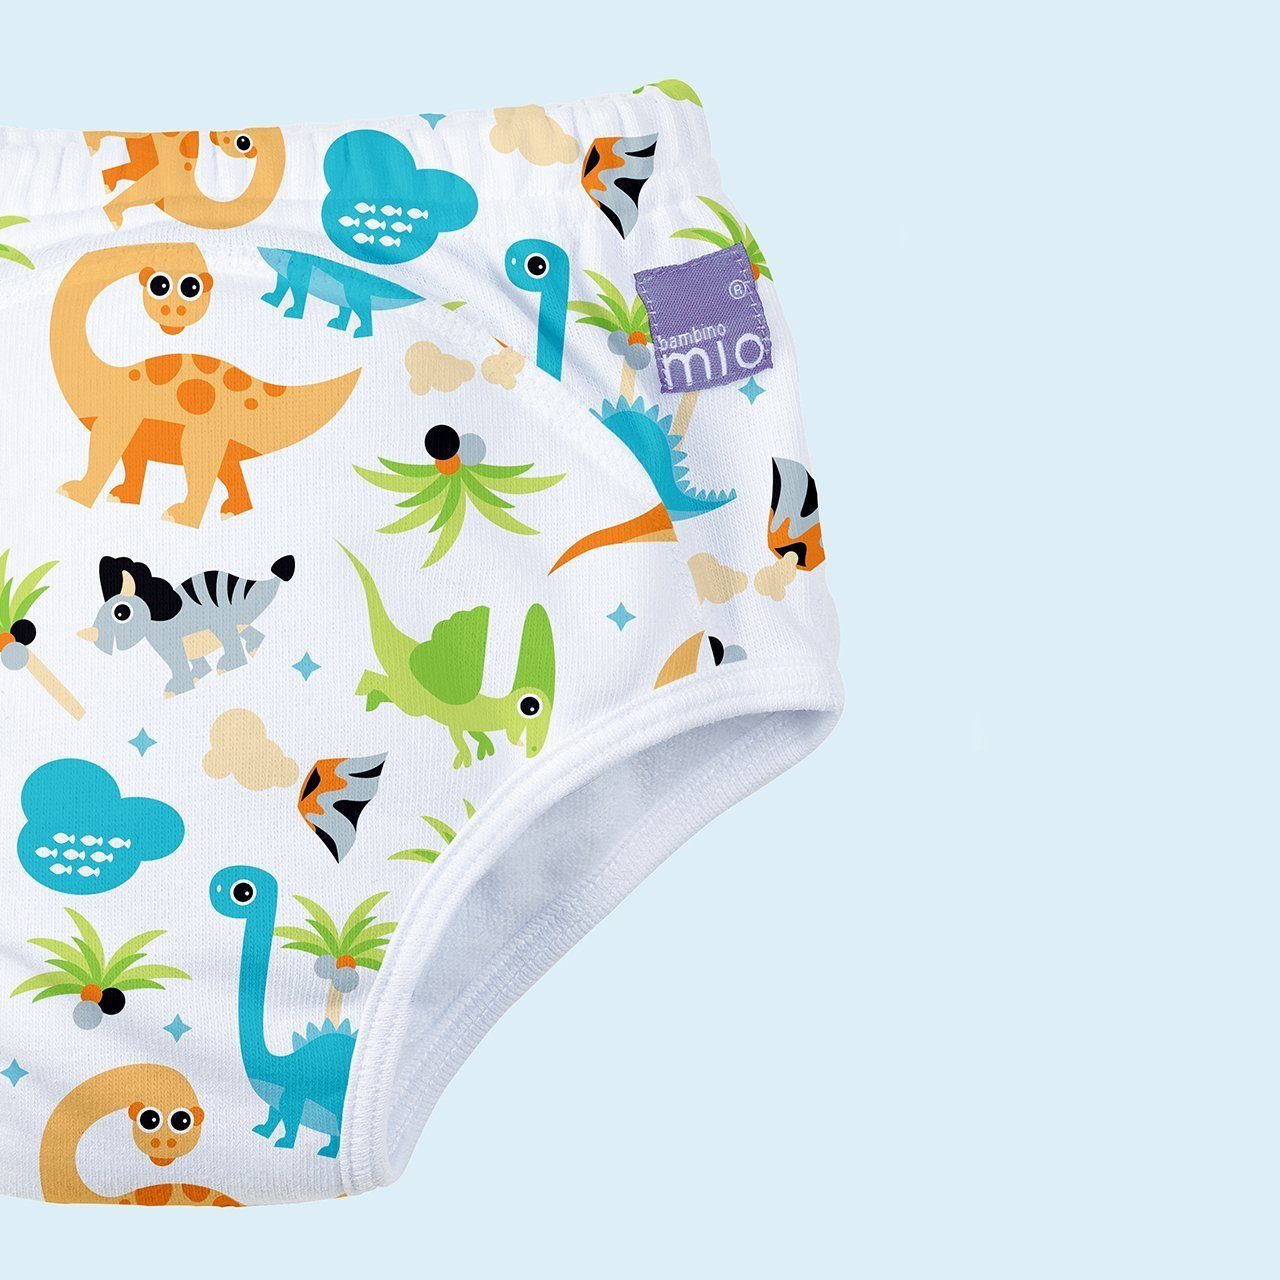 Bambino Mio 18-24 months potty training pants mixed unisex knights kingdom 5 pack